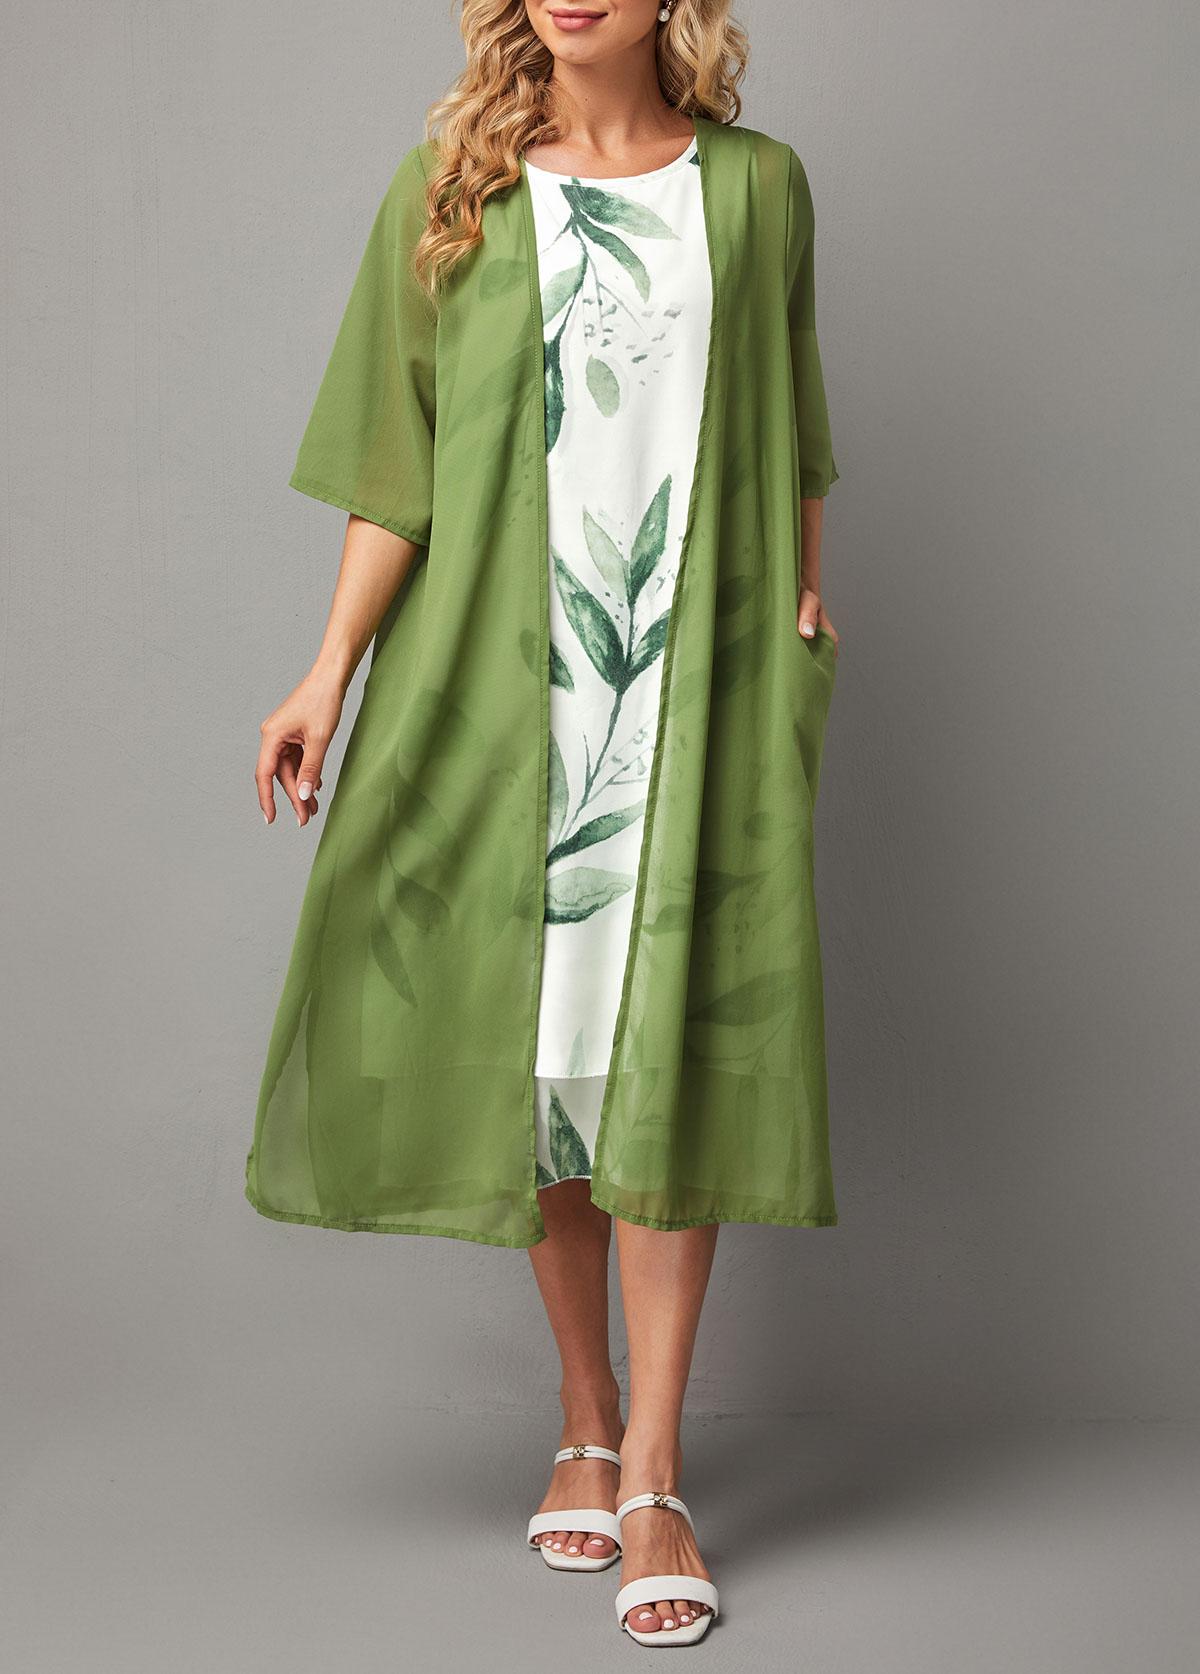 Pocket Solid Cardigan and Leaf Print Dress